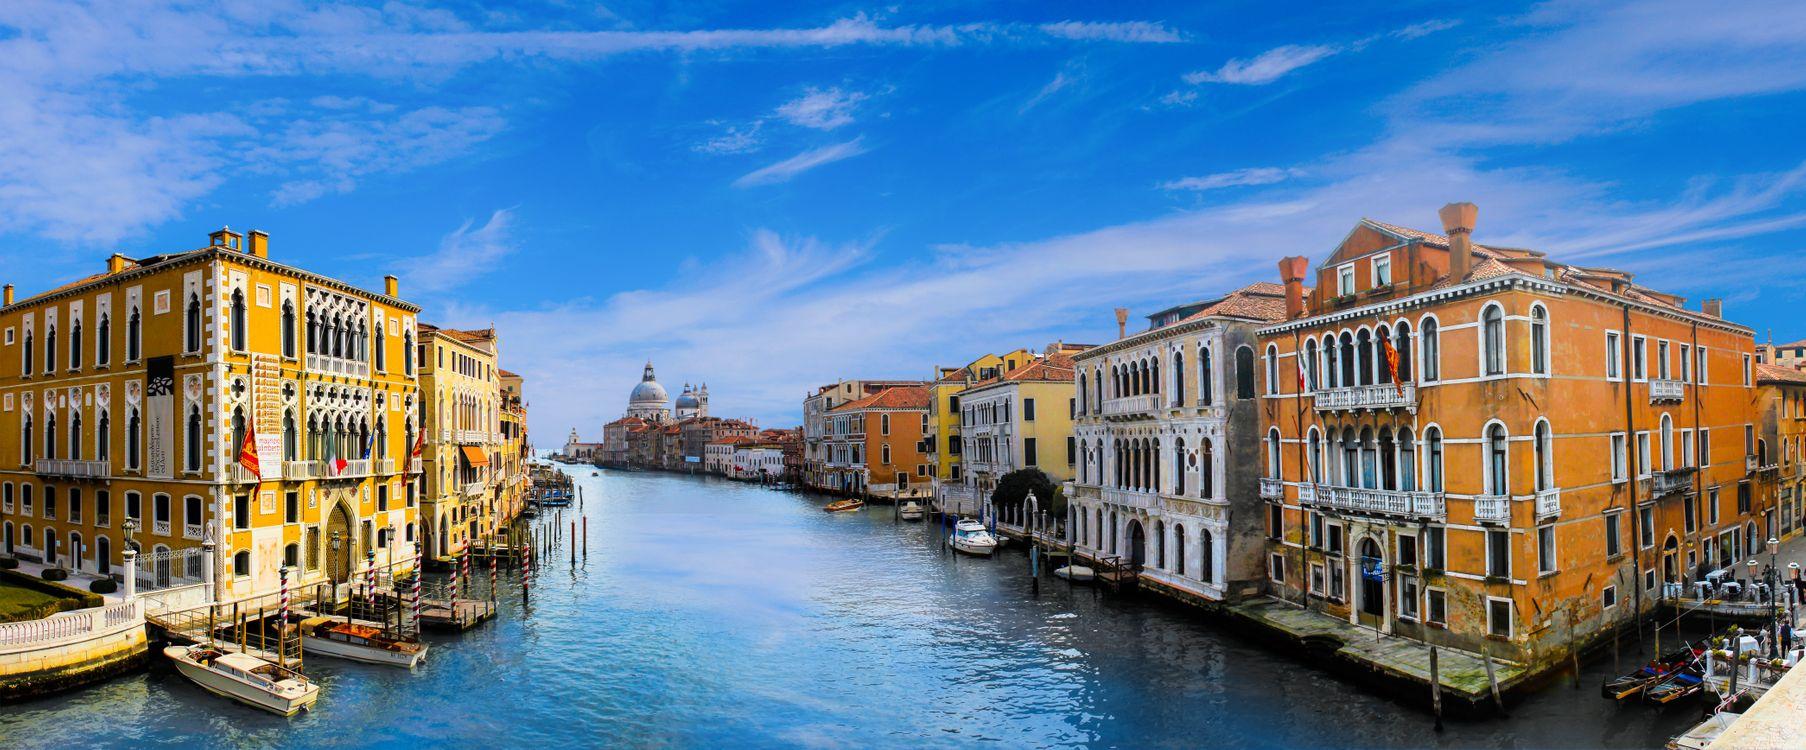 Фото бесплатно Венеция, Италия, Гранд-канал в Венеции, город, панорама, город